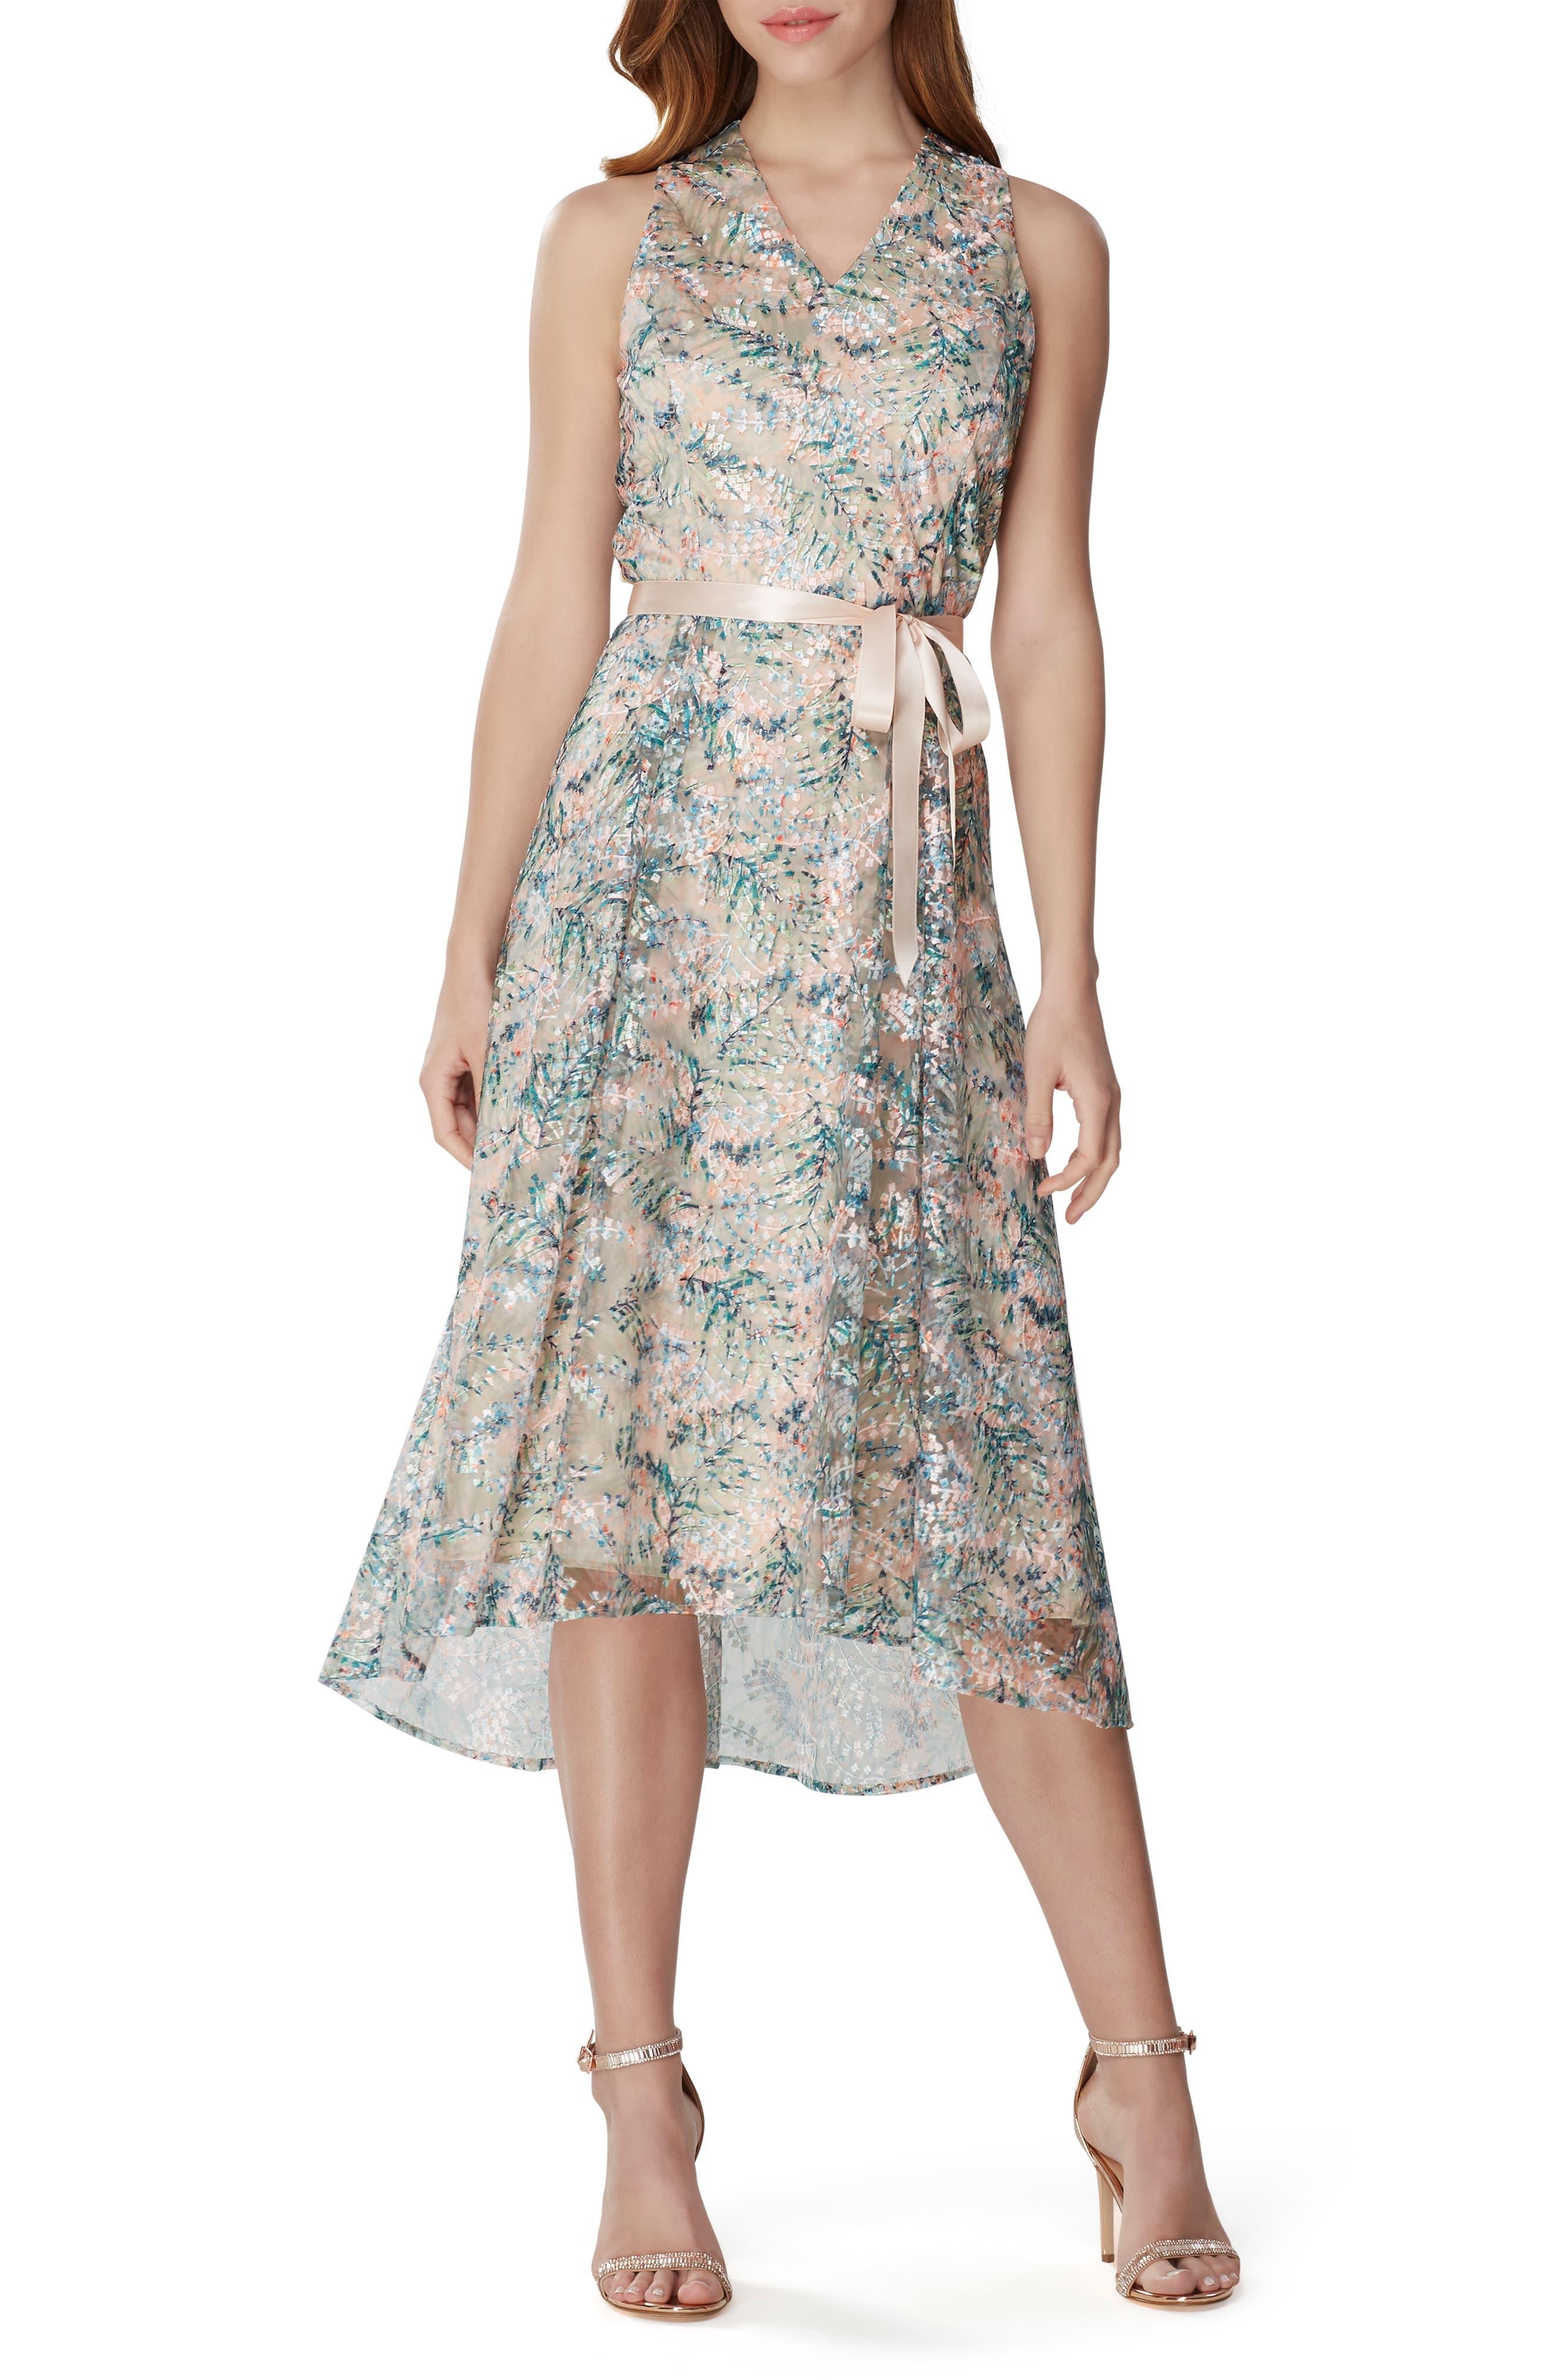 Tahari Embroidered Sleeveless Dress, Blue